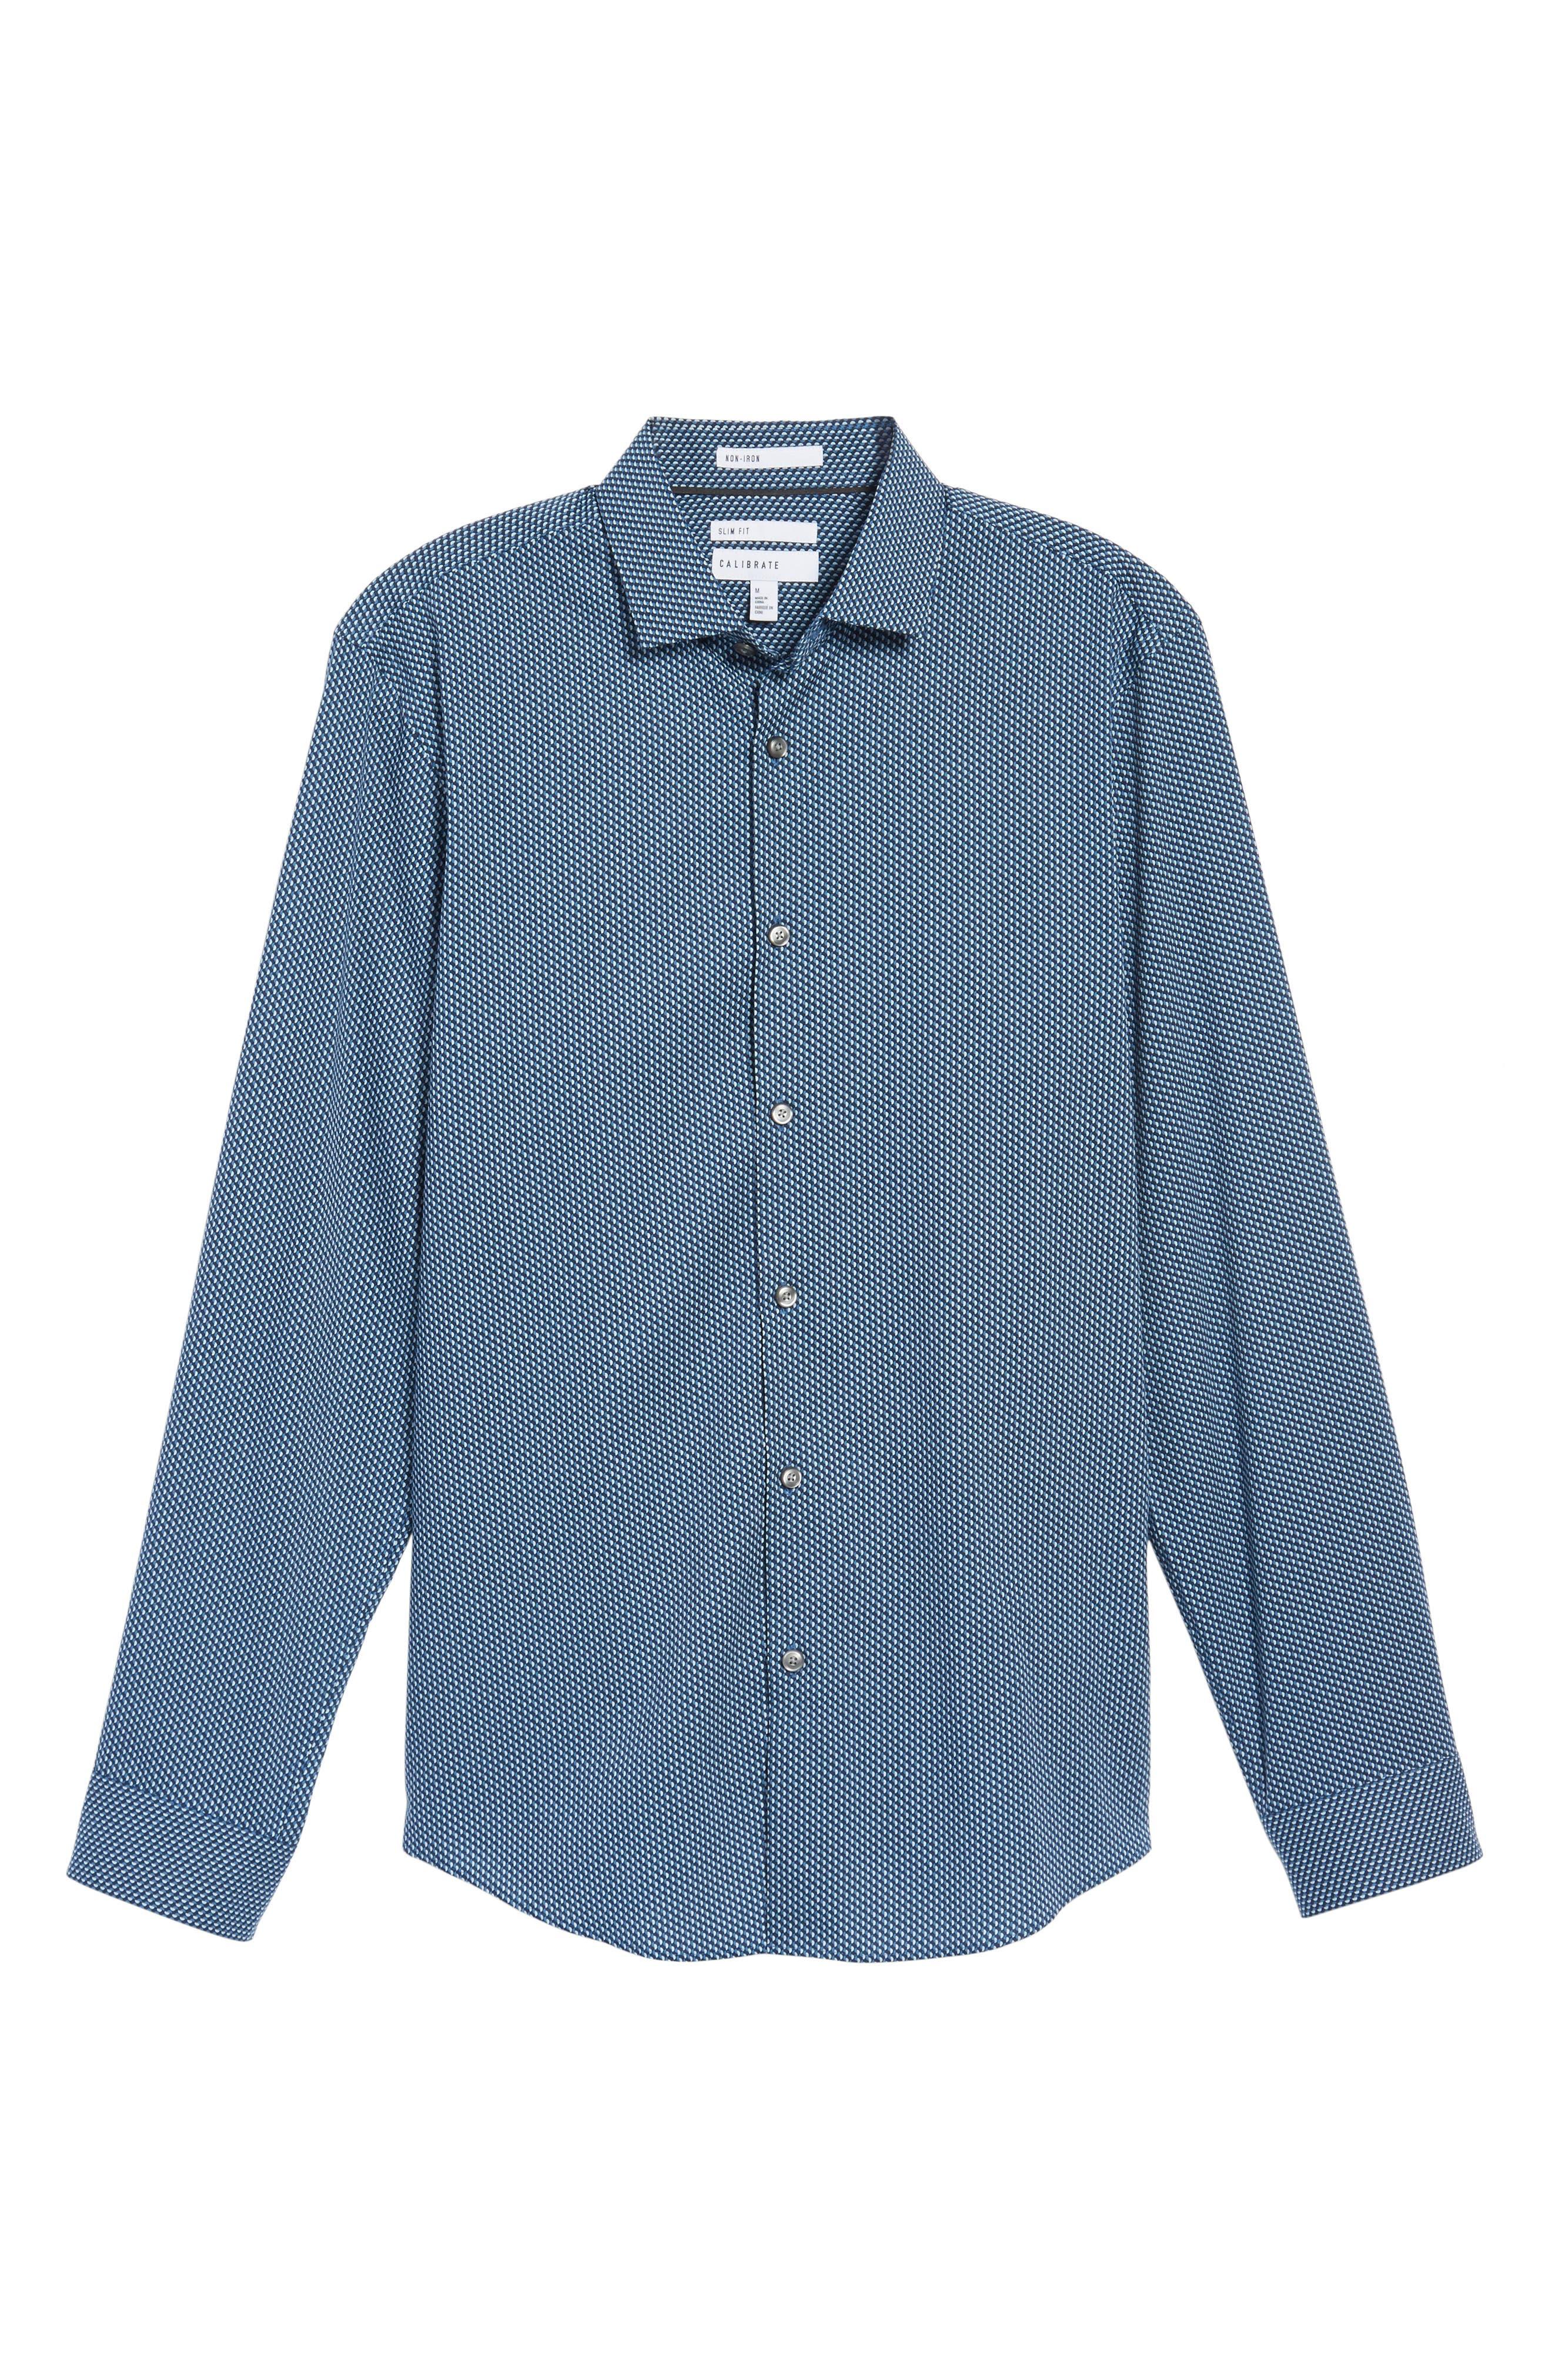 Print Sport Shirt,                             Alternate thumbnail 6, color,                             Blue Ice Navy Geo Print